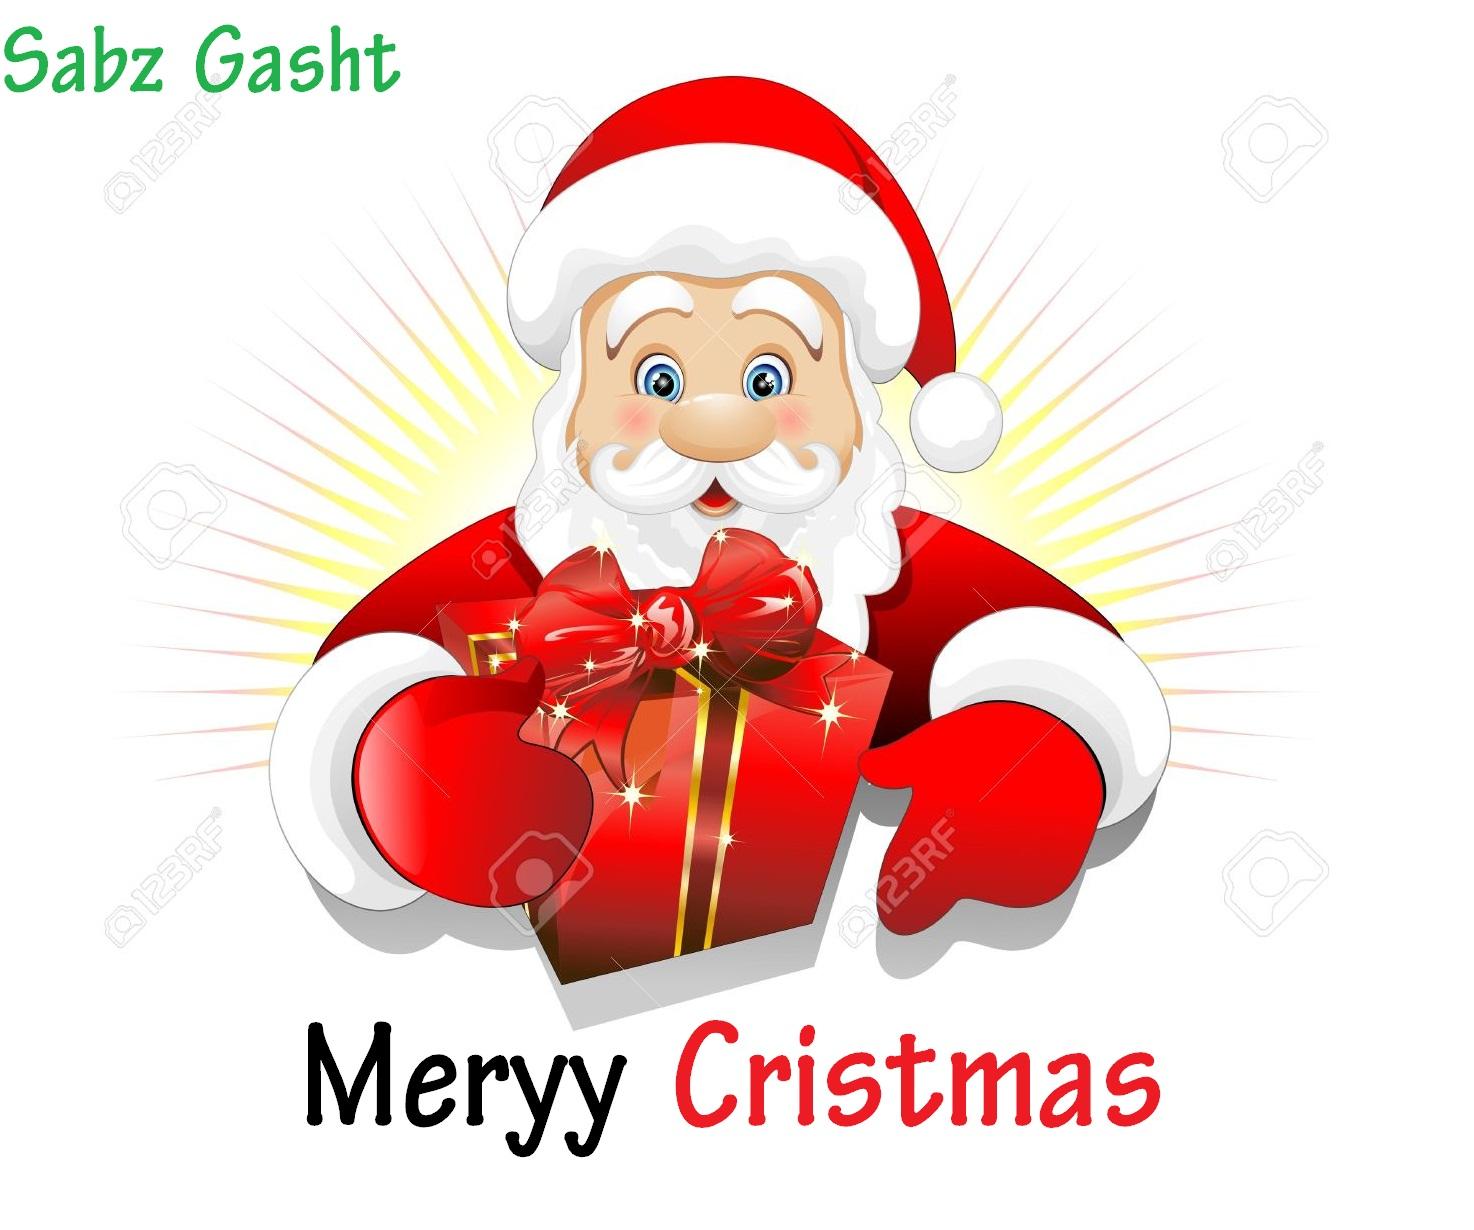 http://s8.picofile.com/file/8279994950/Merry_Cristmas.jpg